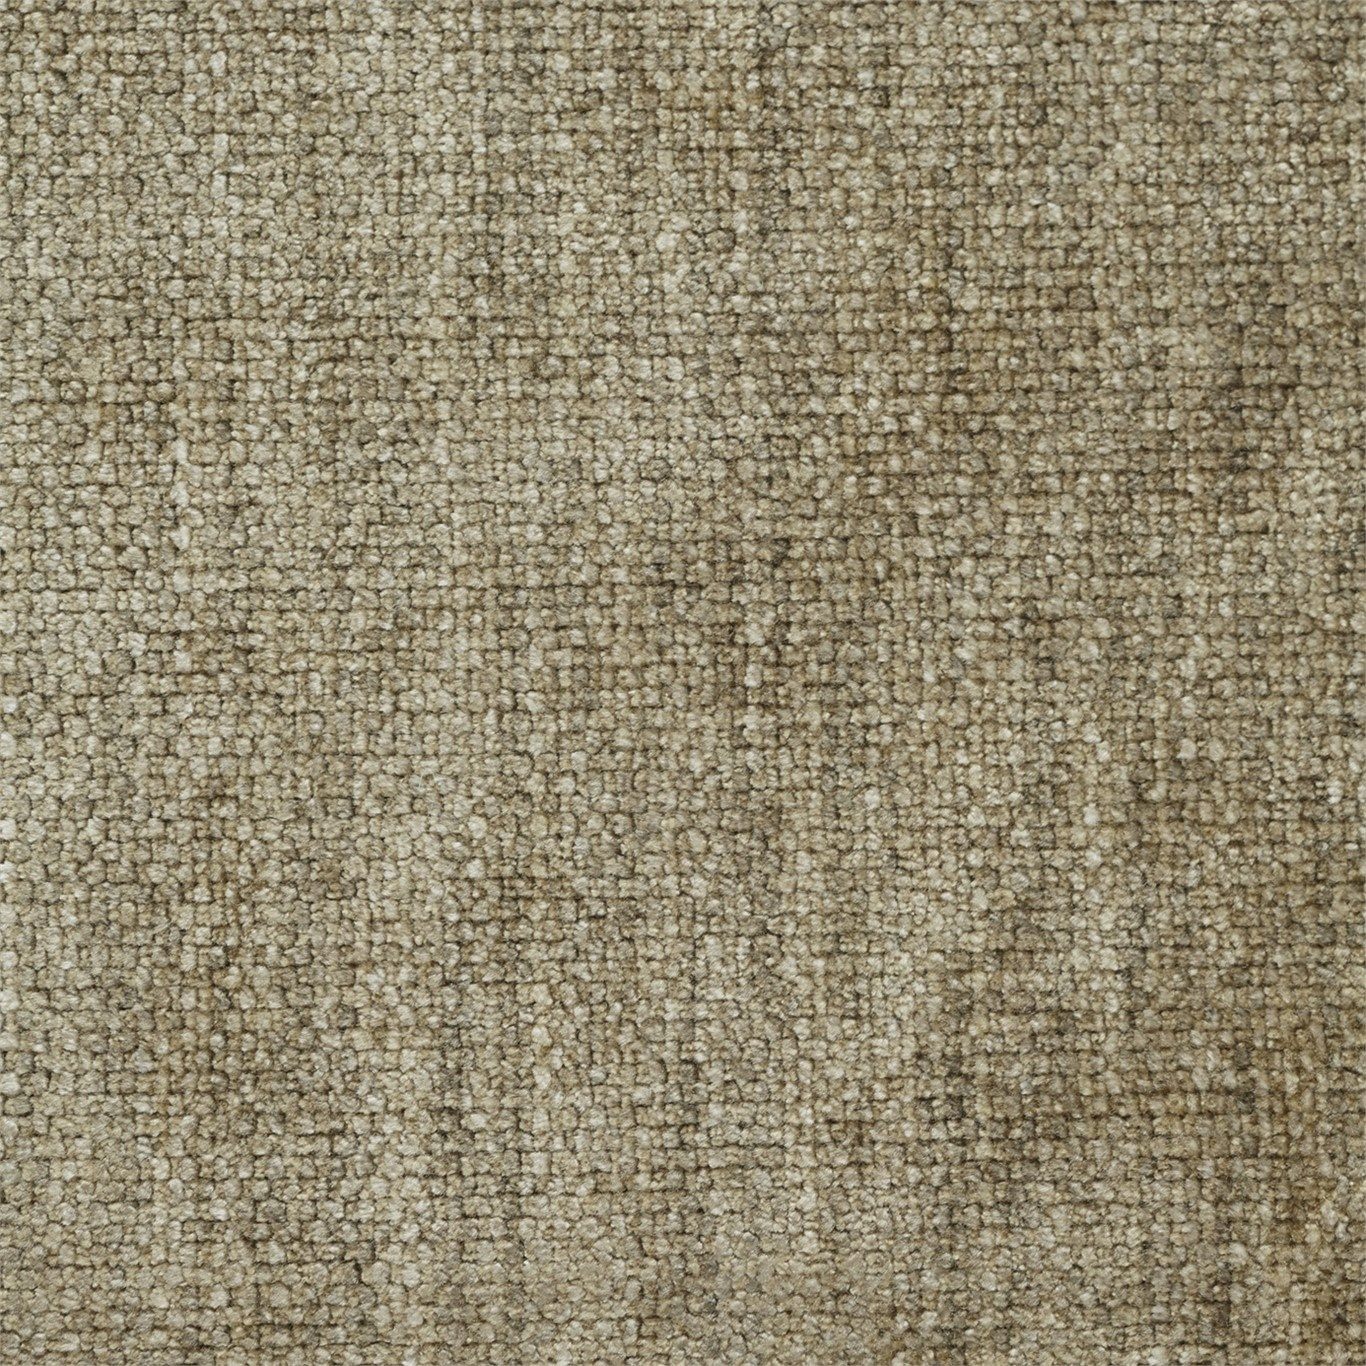 Image of Sanderson Moorbank Honey Fabric 236297